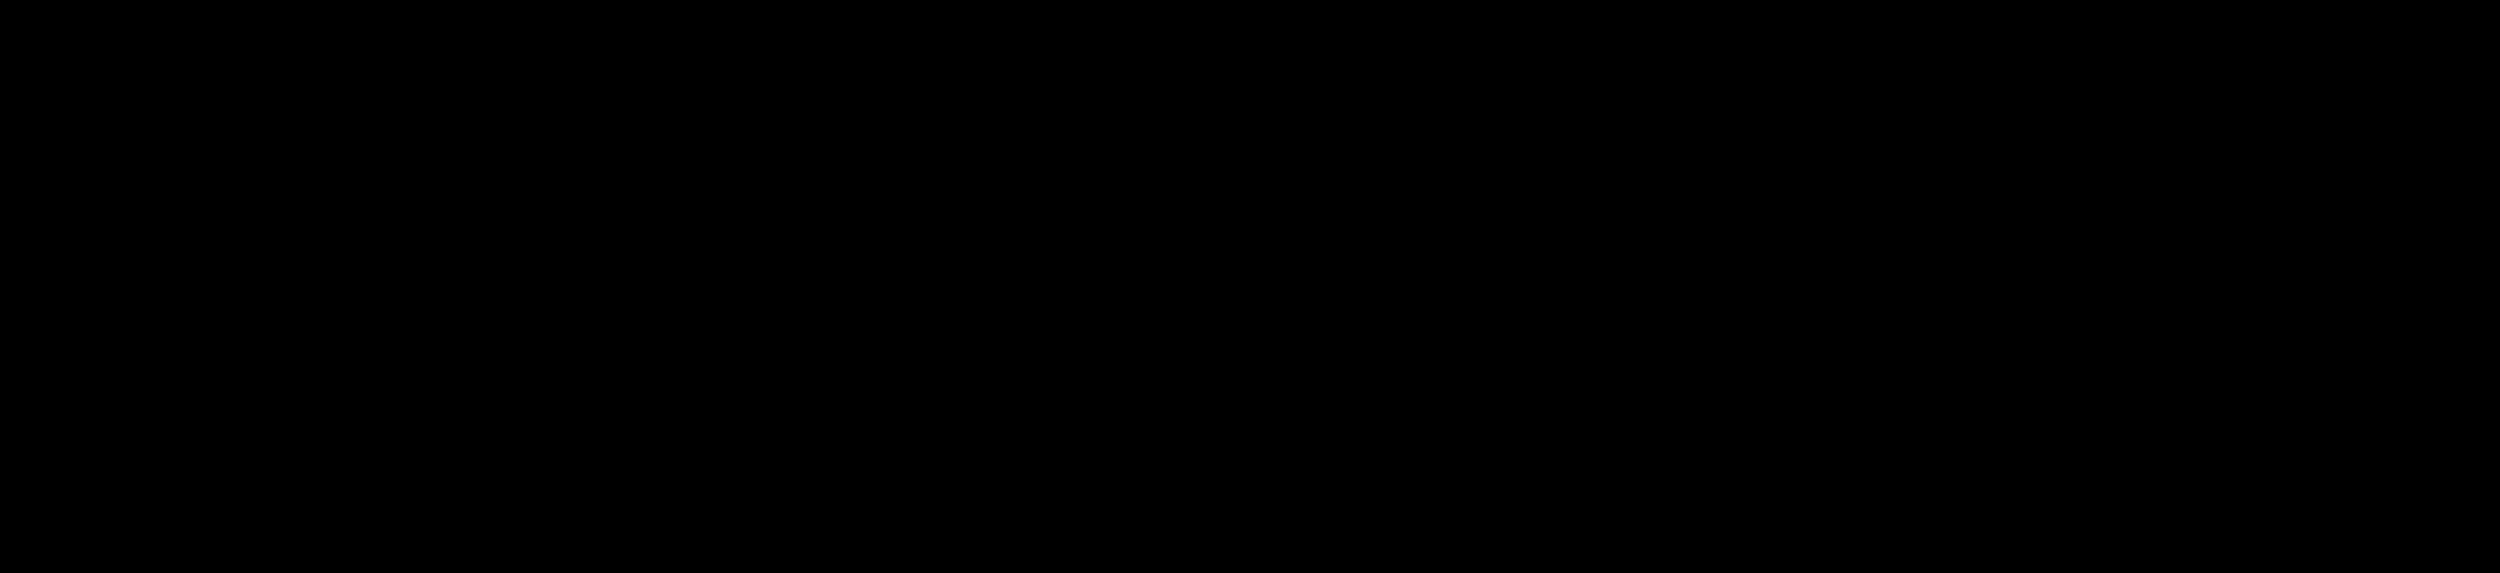 NetFit_Logo_Black_1024px.png